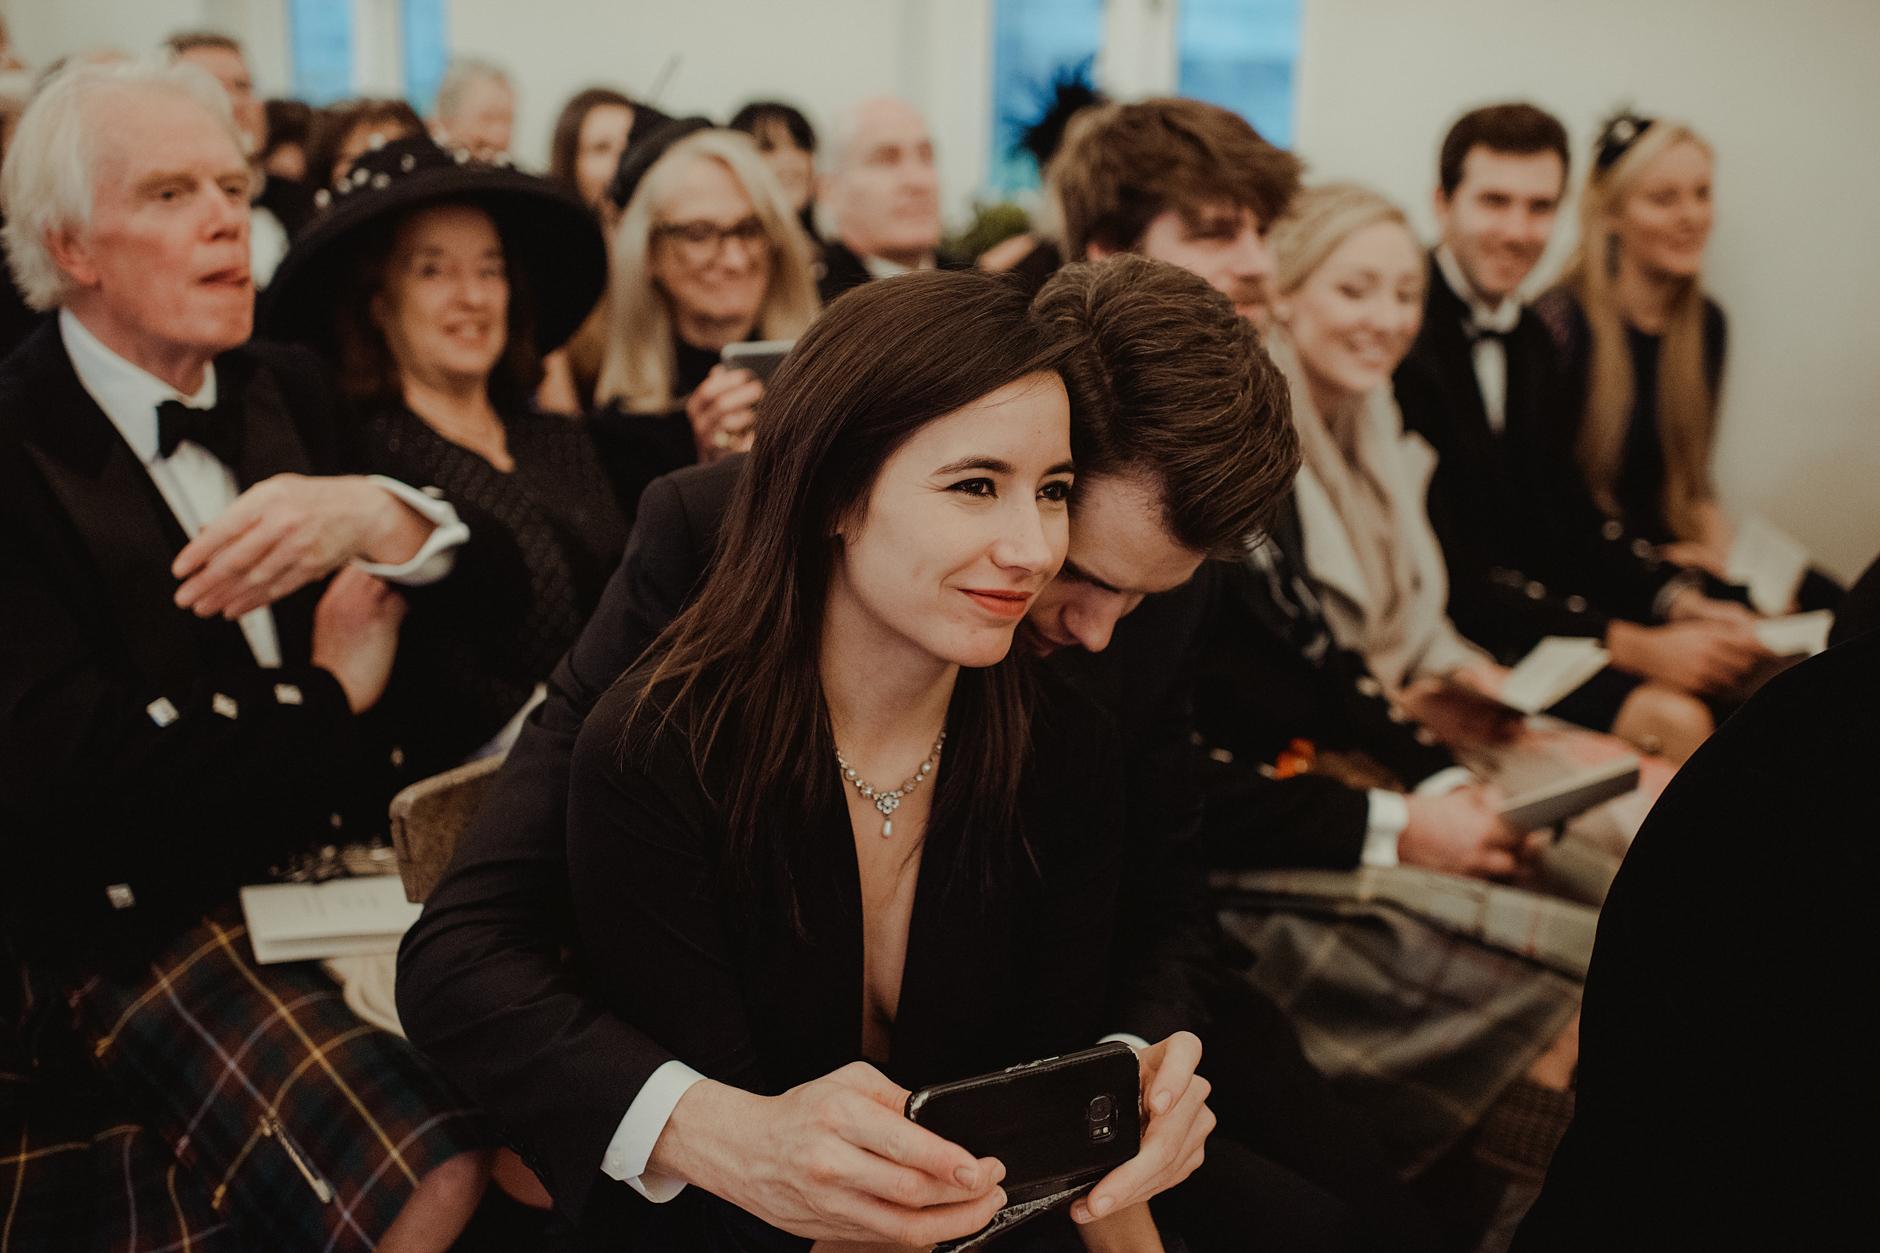 Glentruim-Wedding-Nikki-Leadbetter-Photography-99.jpg